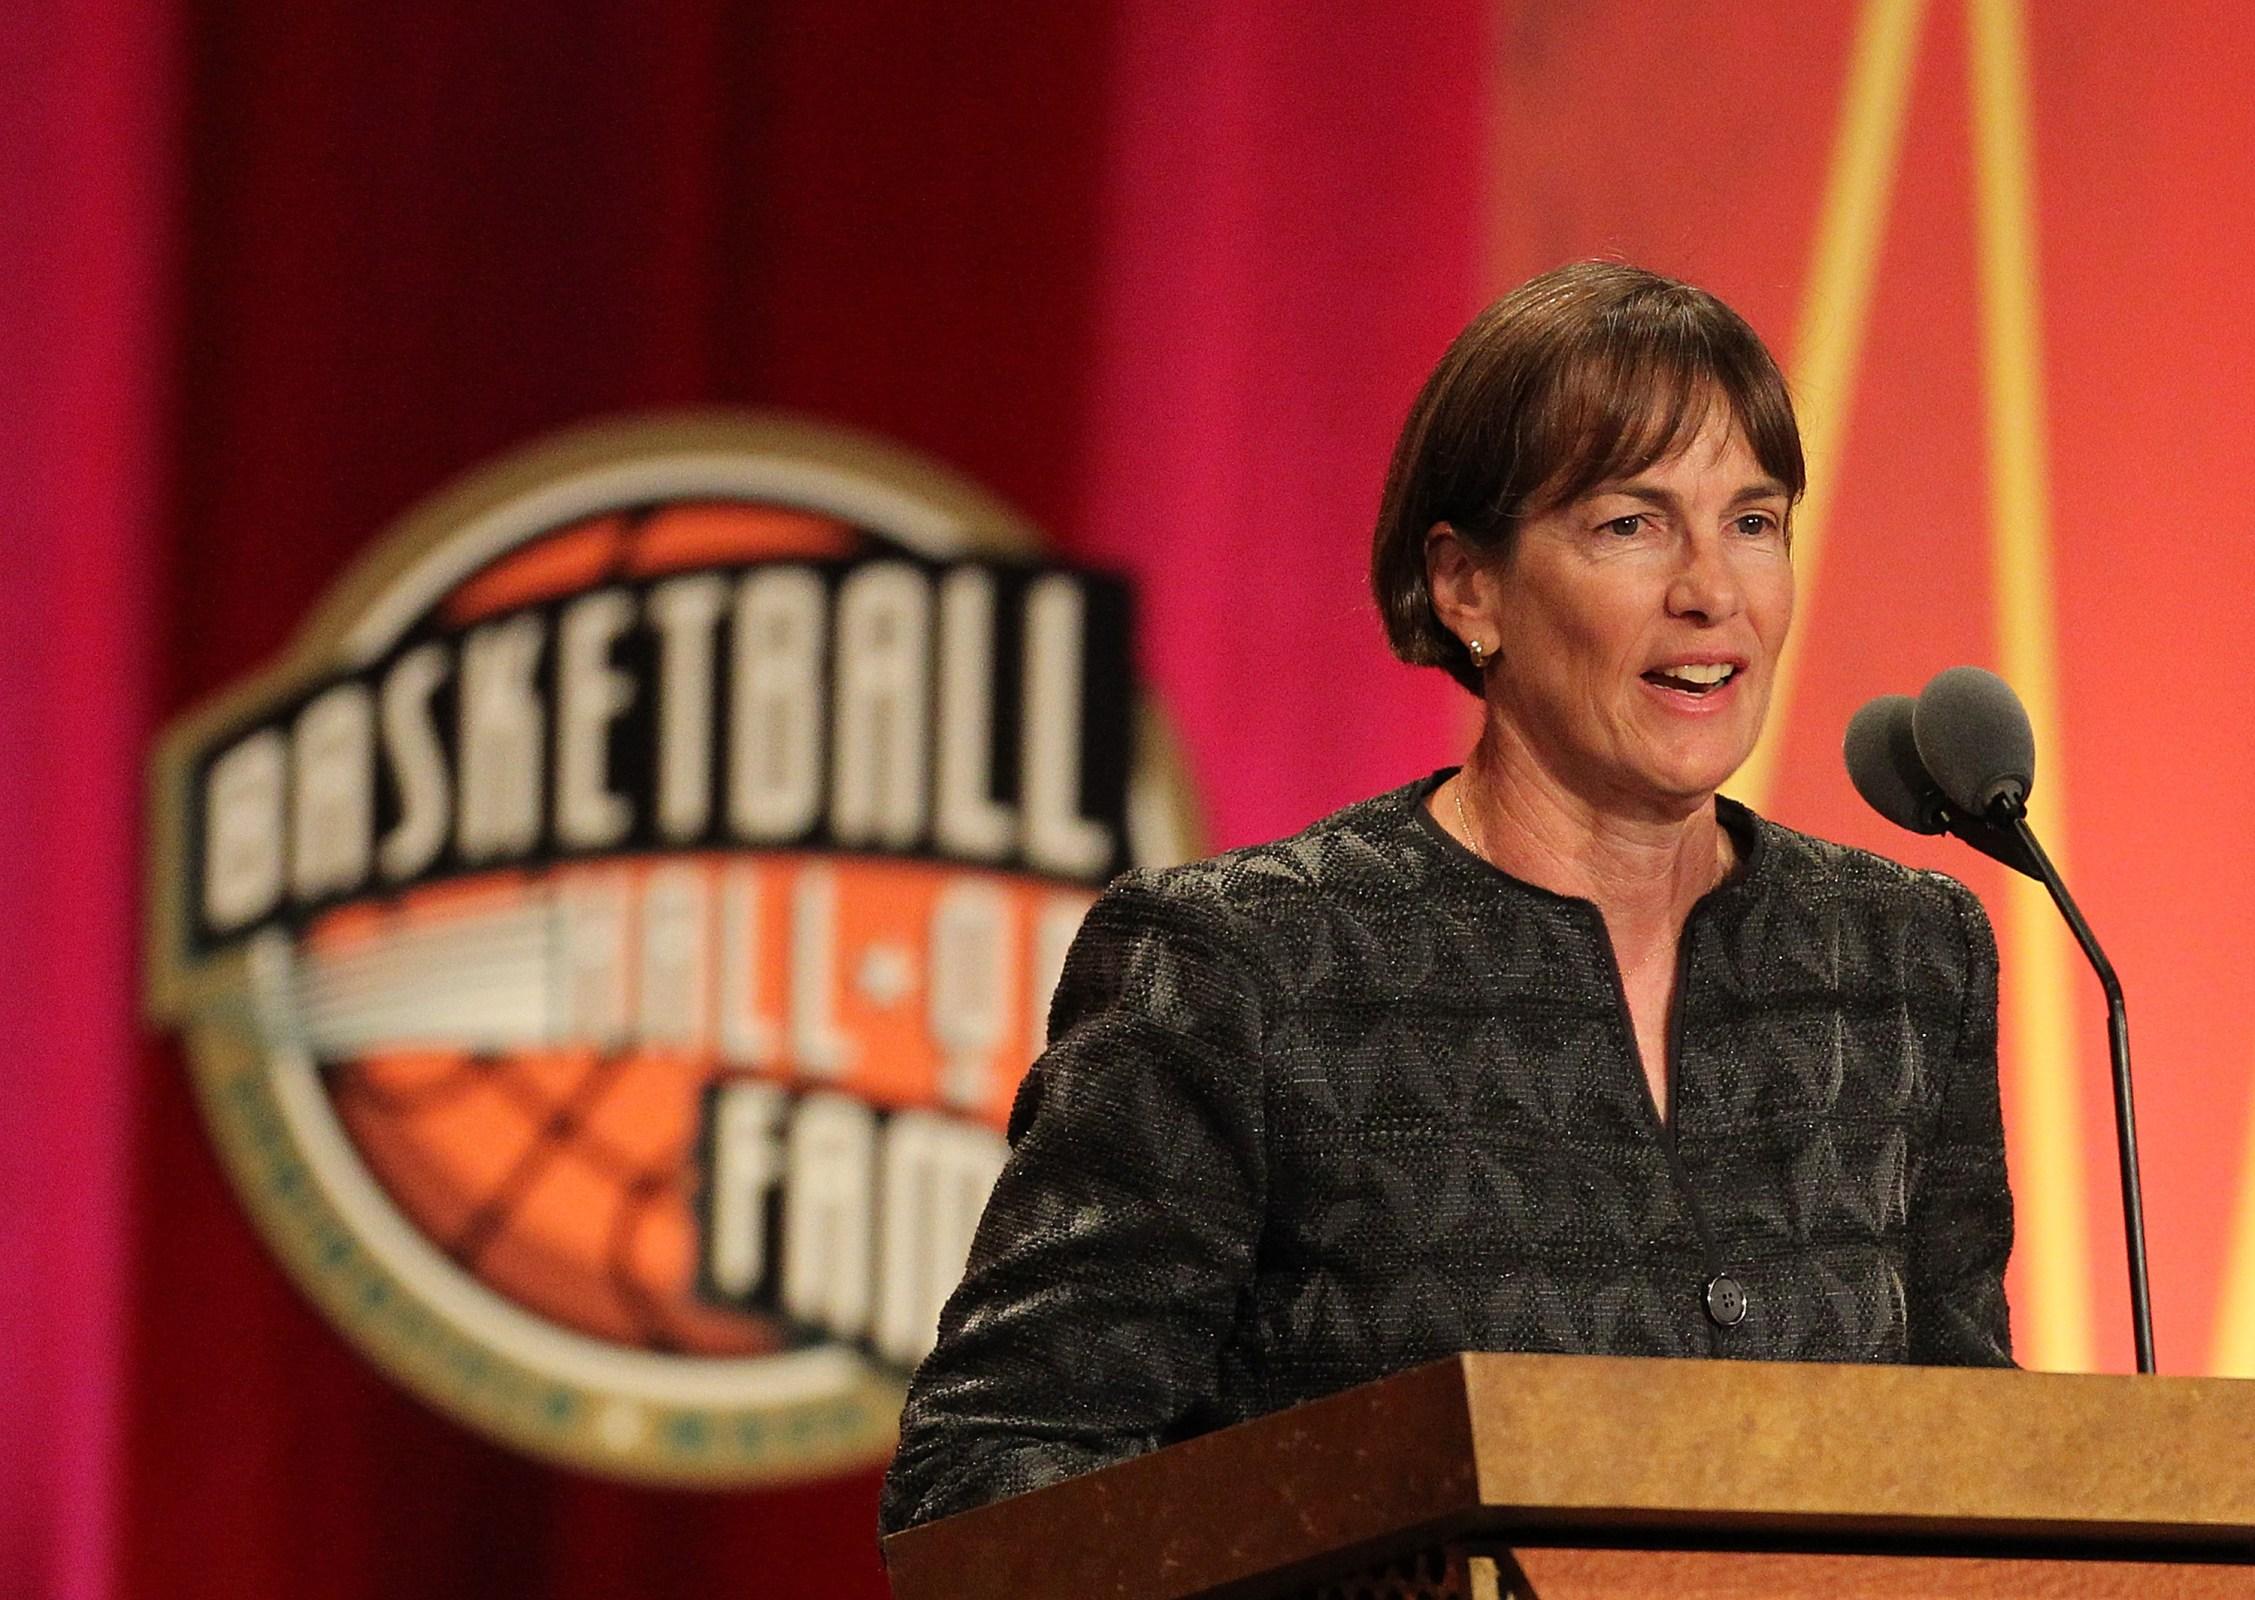 Tara VanDerveer speaks during the Basketball Hall of Fame Enshrinement Ceremony at Symphony Hall on August 12, 2011 in Springfield, Massachusetts.